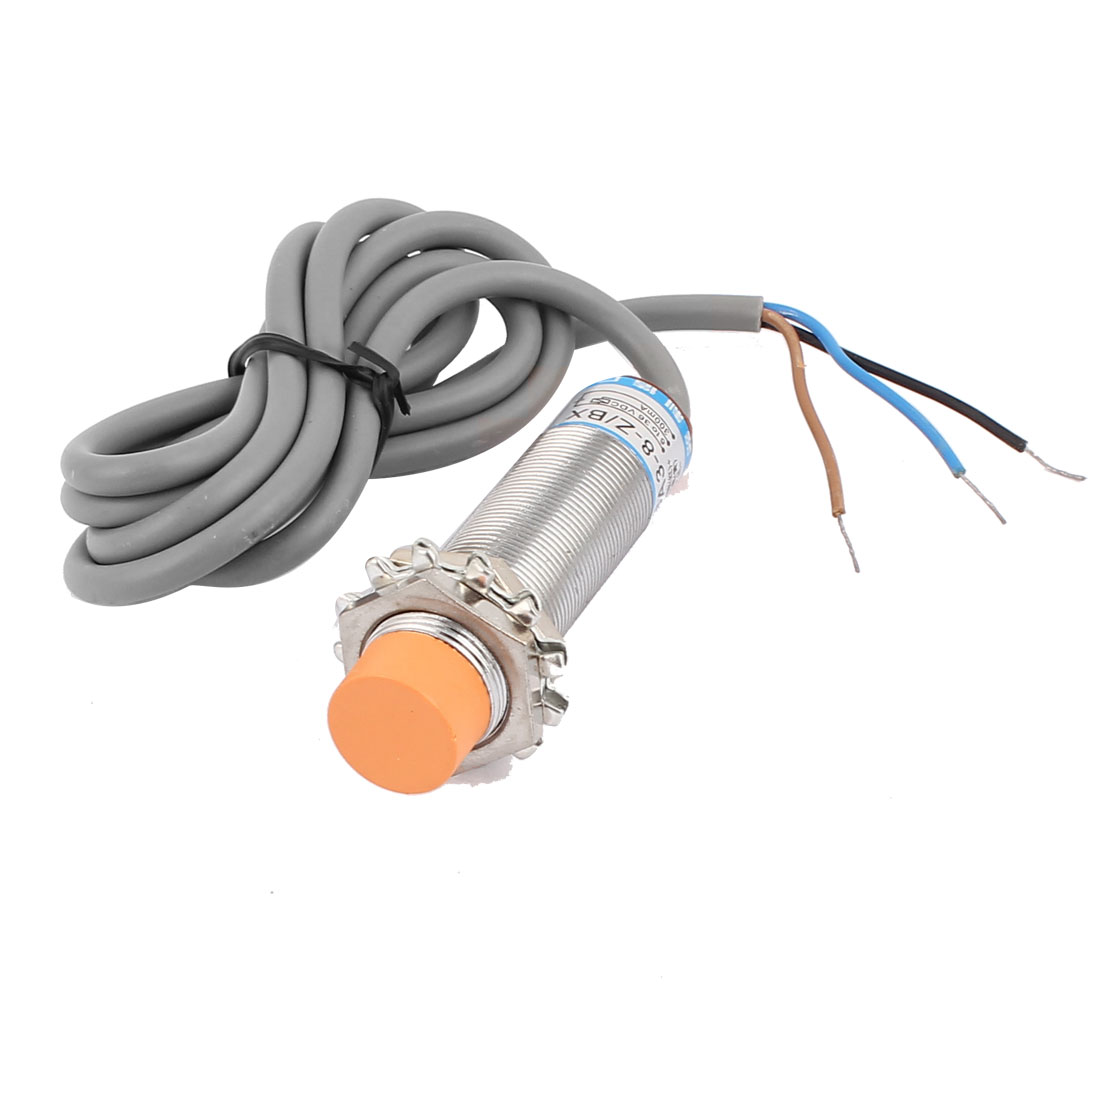 DC 6-36V 300mA 8mm NPN 3-Wire Tubular Inductive Proximity Sensor Switch